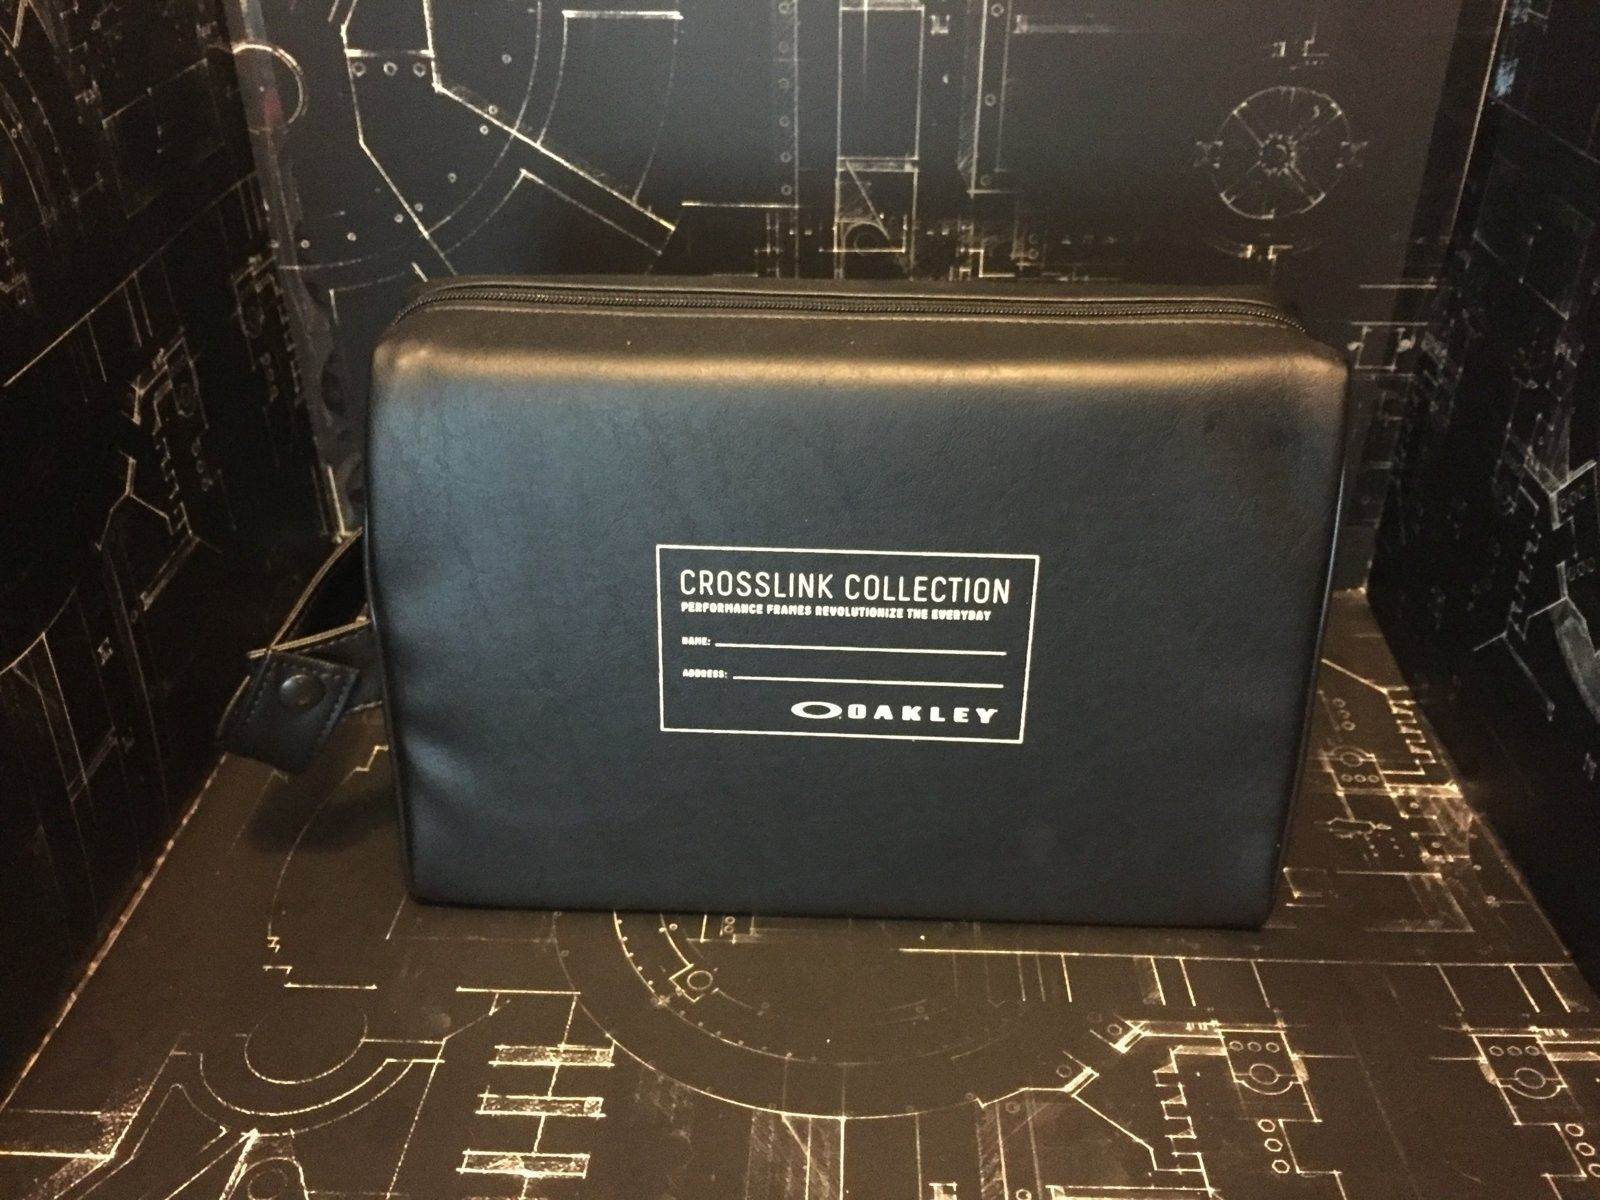 Crosslink collector bundle - image.jpeg